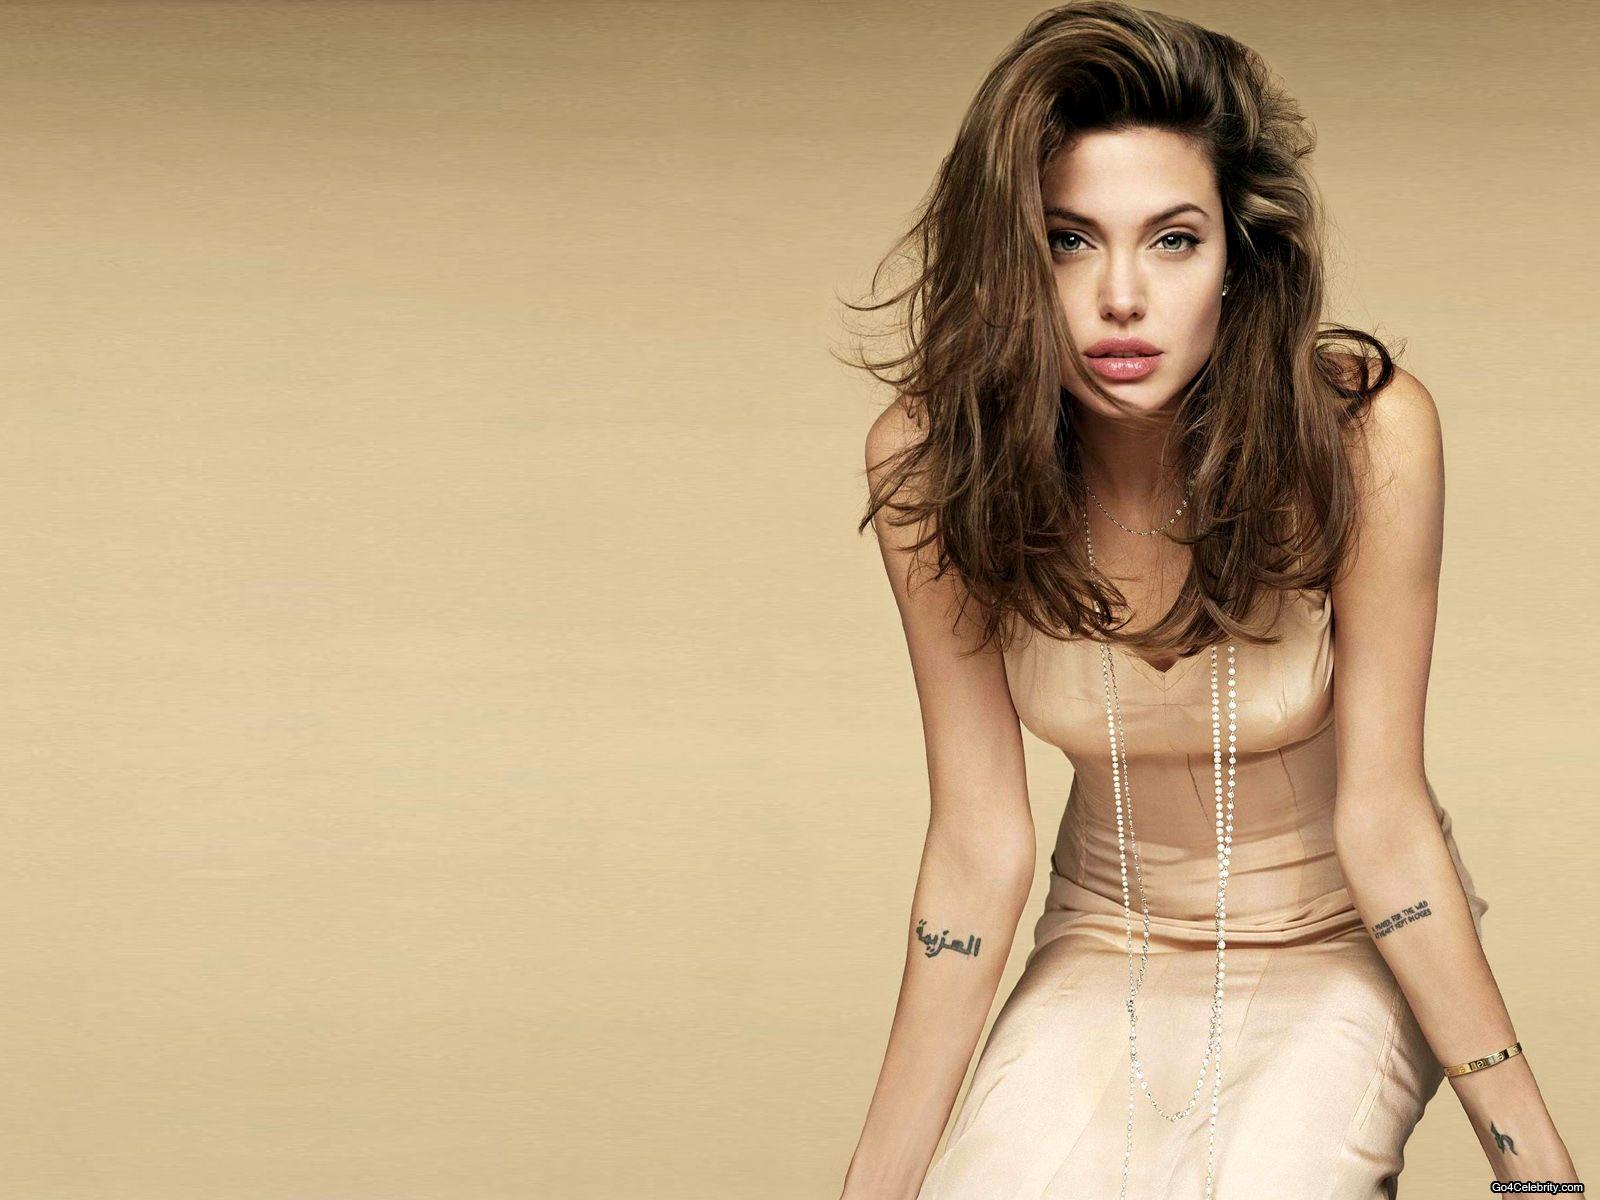 http://2.bp.blogspot.com/-sNY10ZQan7o/UBTlCA8nGhI/AAAAAAAAMbU/5IOM6jGySS8/s1600/Angelina-Jolie-211.jpg